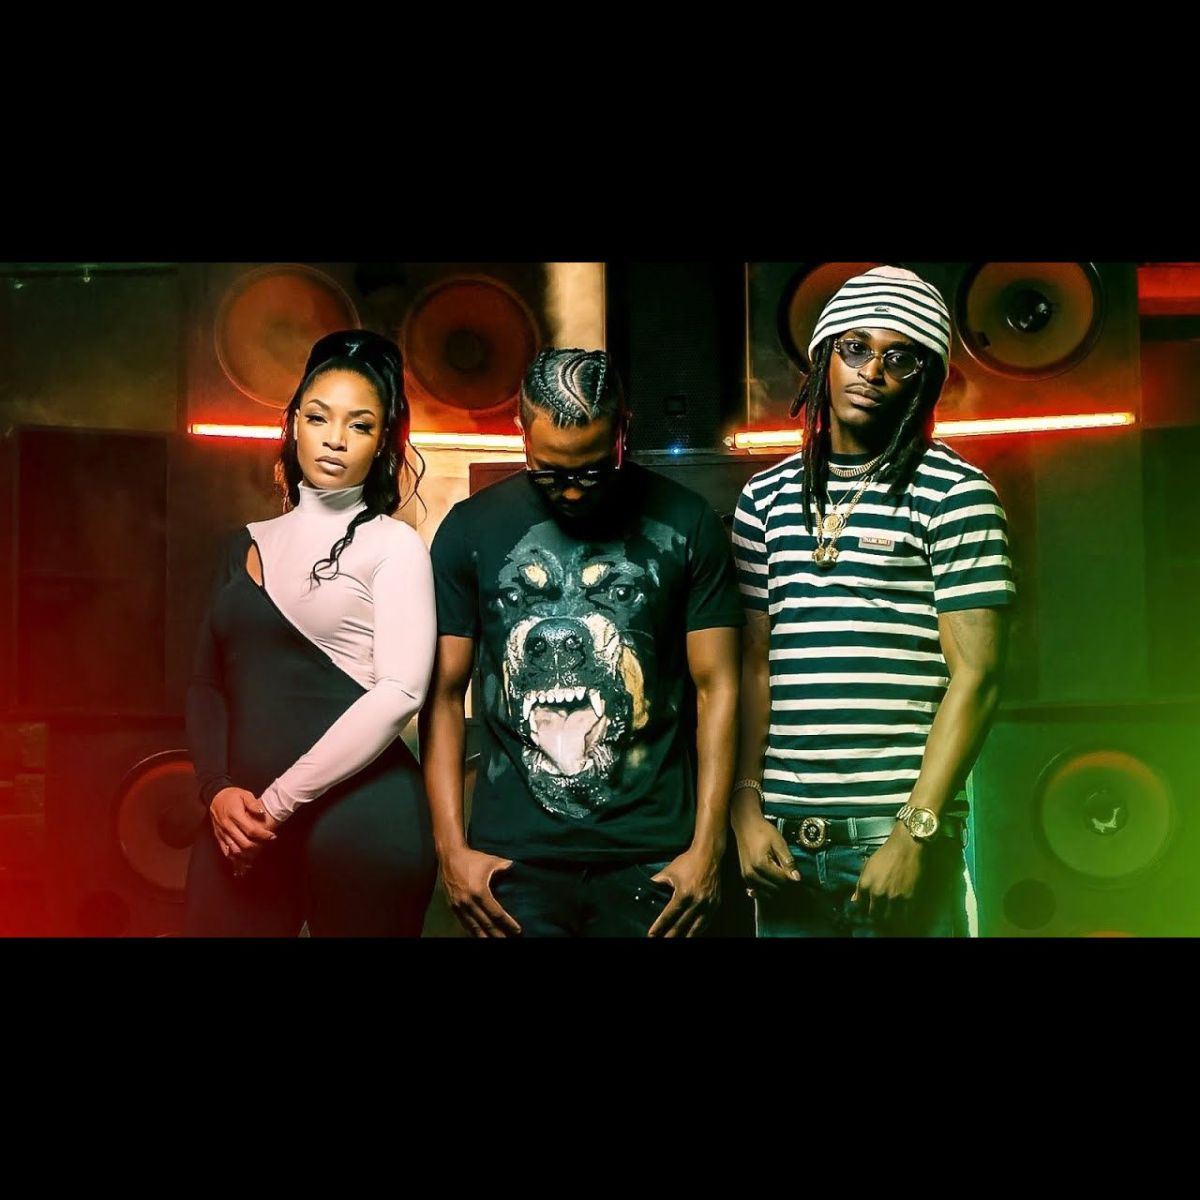 DJ Bryan - Tête chapé (ft. Stony and Lion P) (Thumbnail)